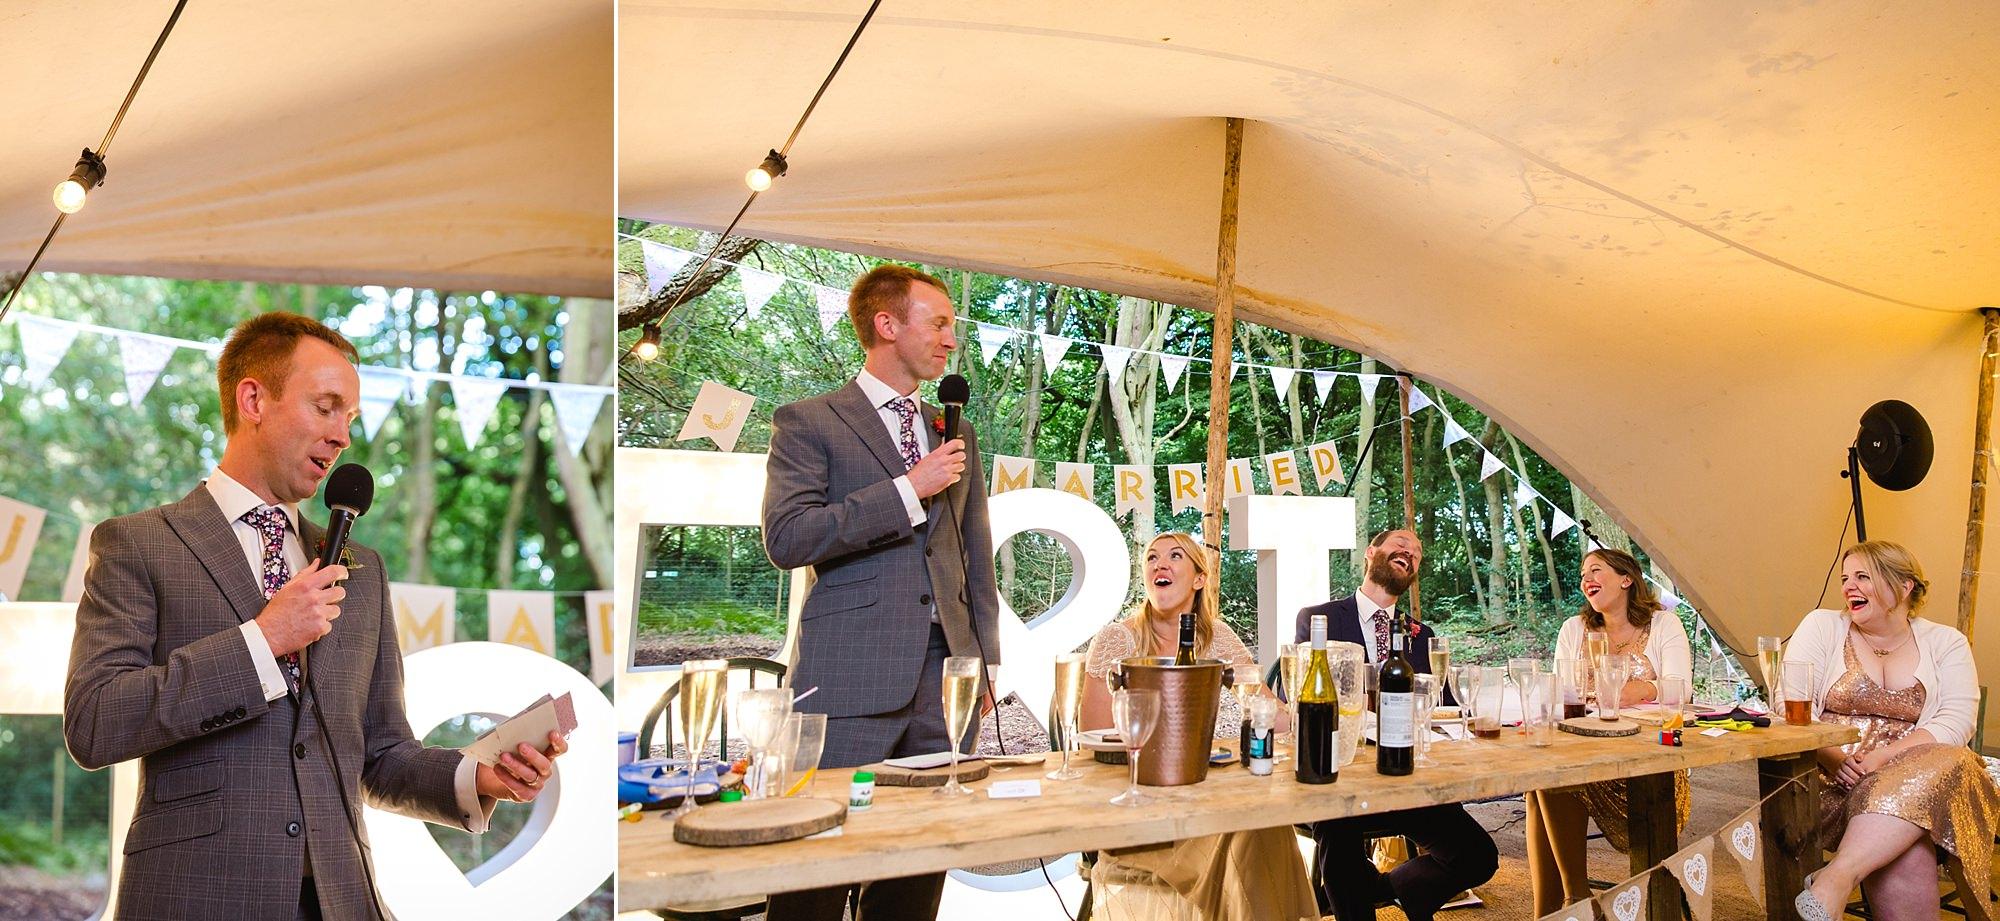 Woodland Weddings Tring best man speech